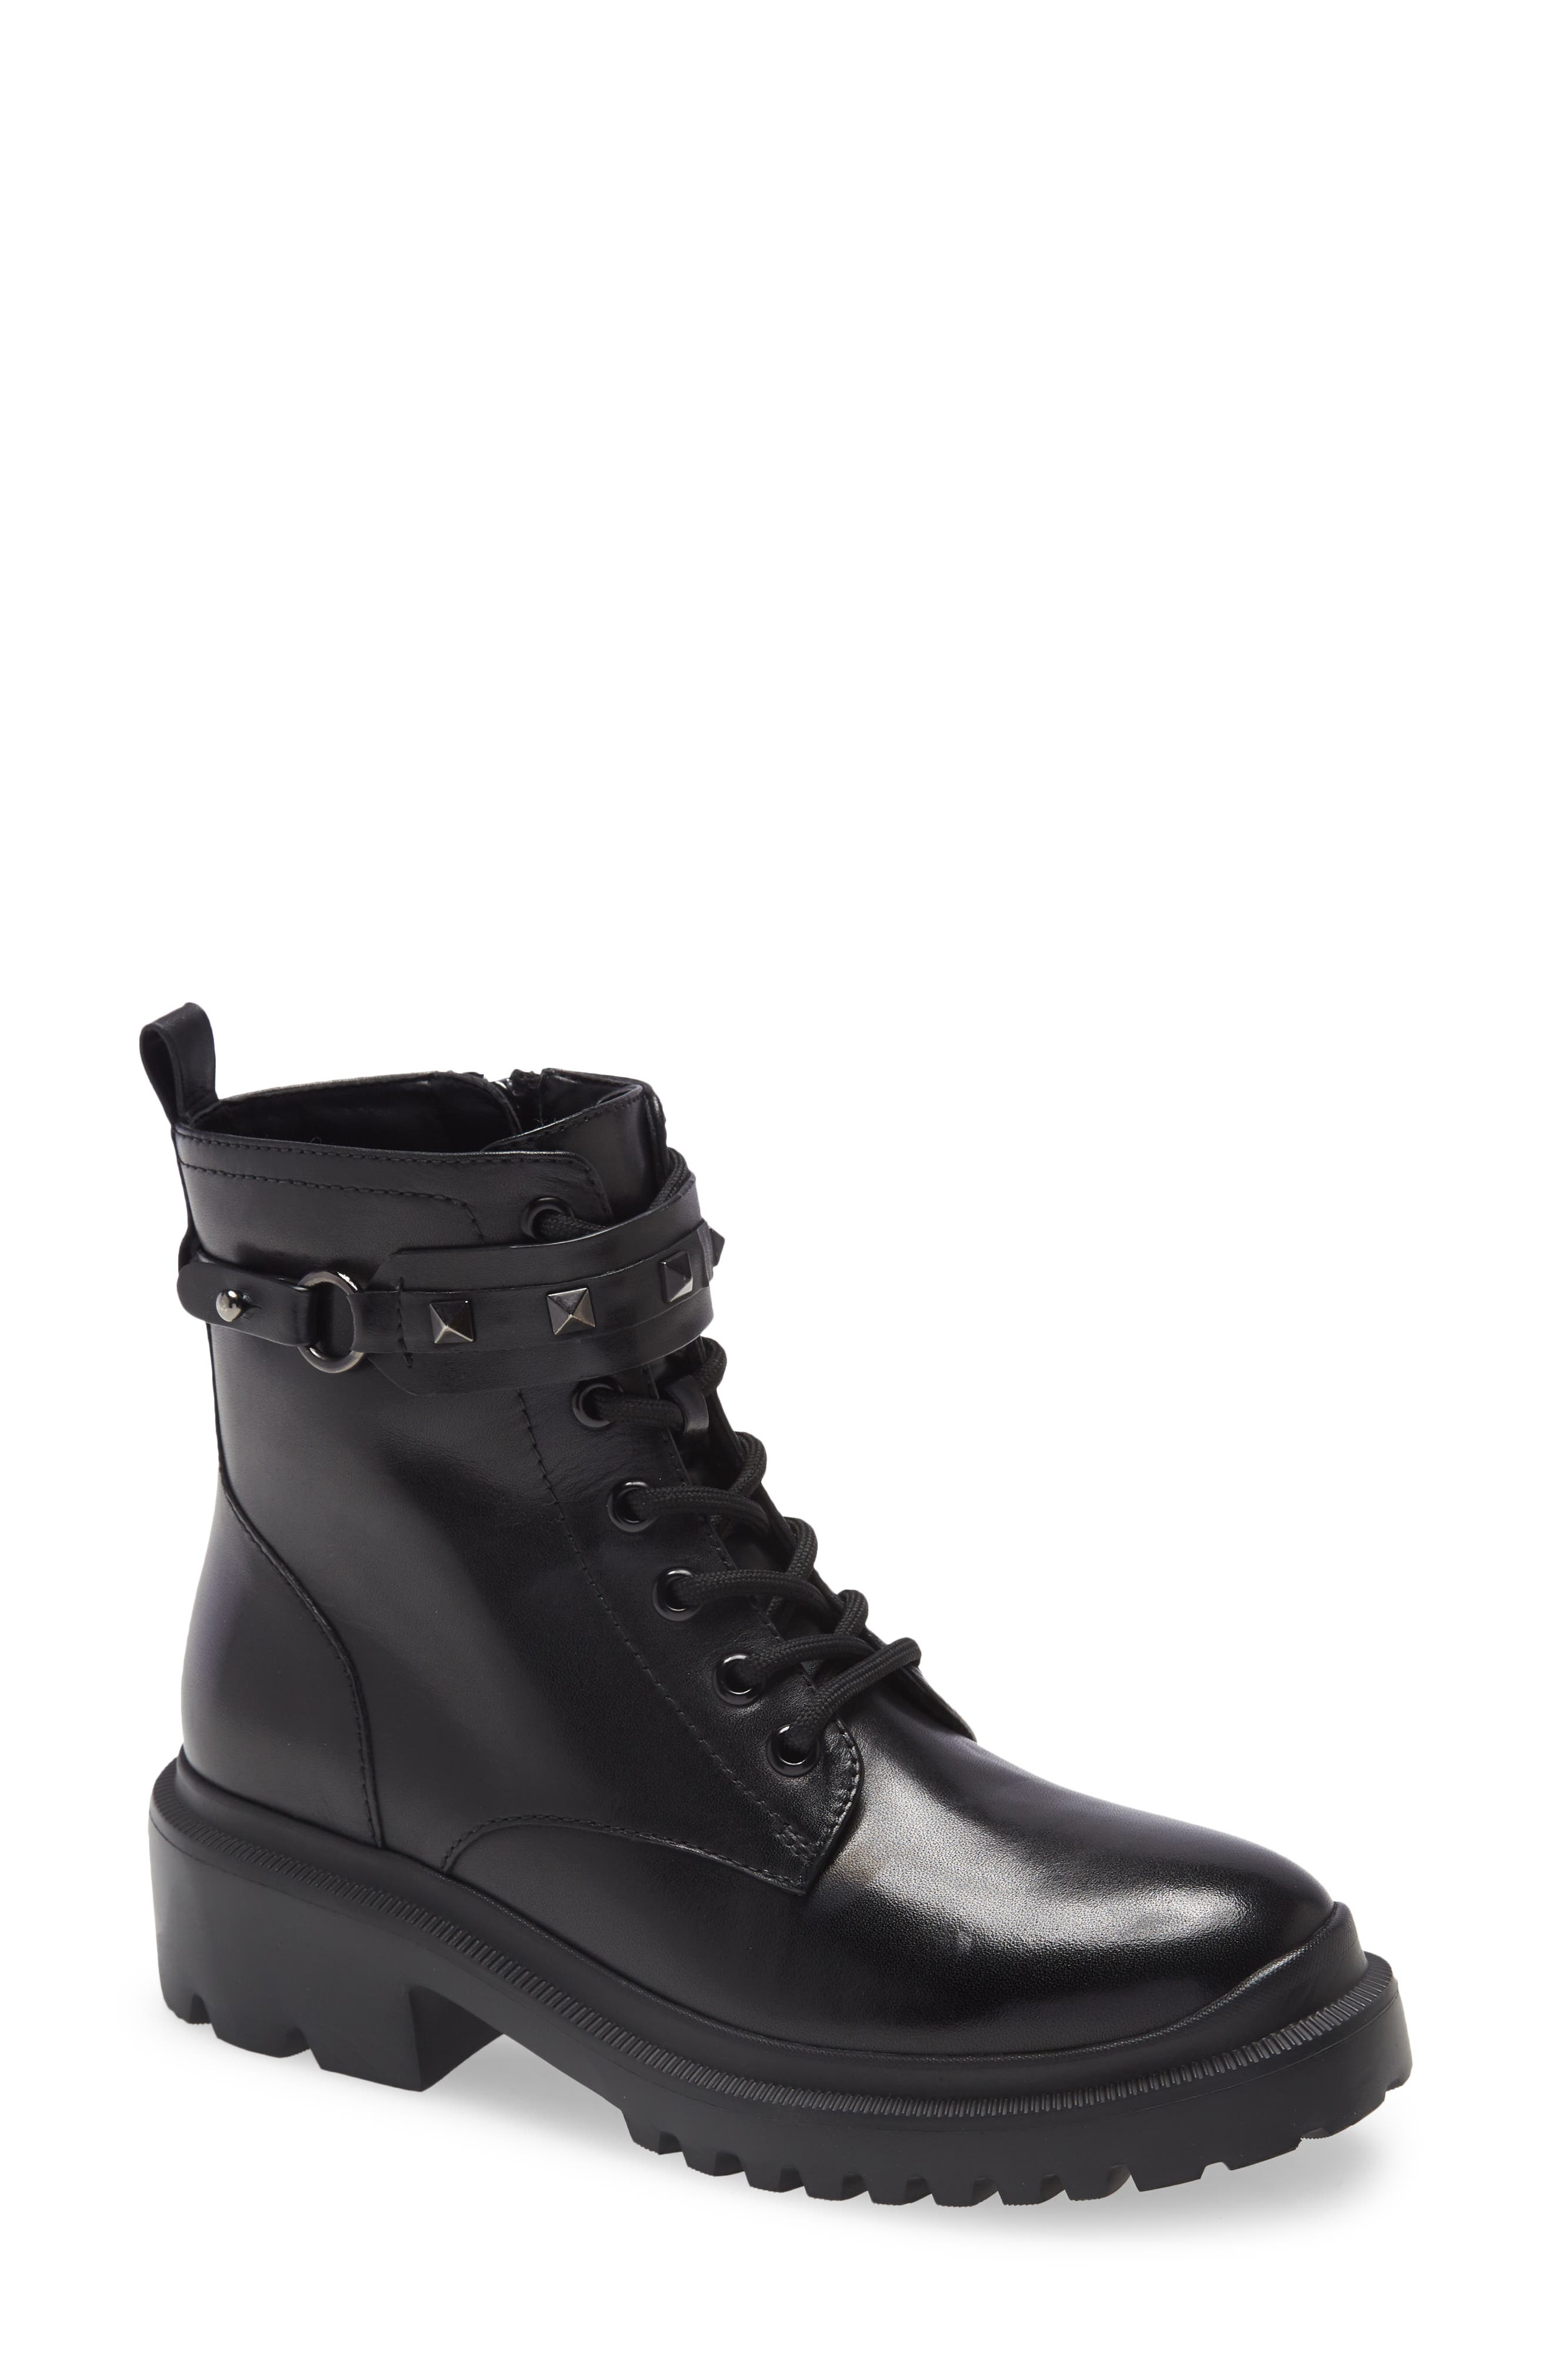 Cecilia Waterproof Boot